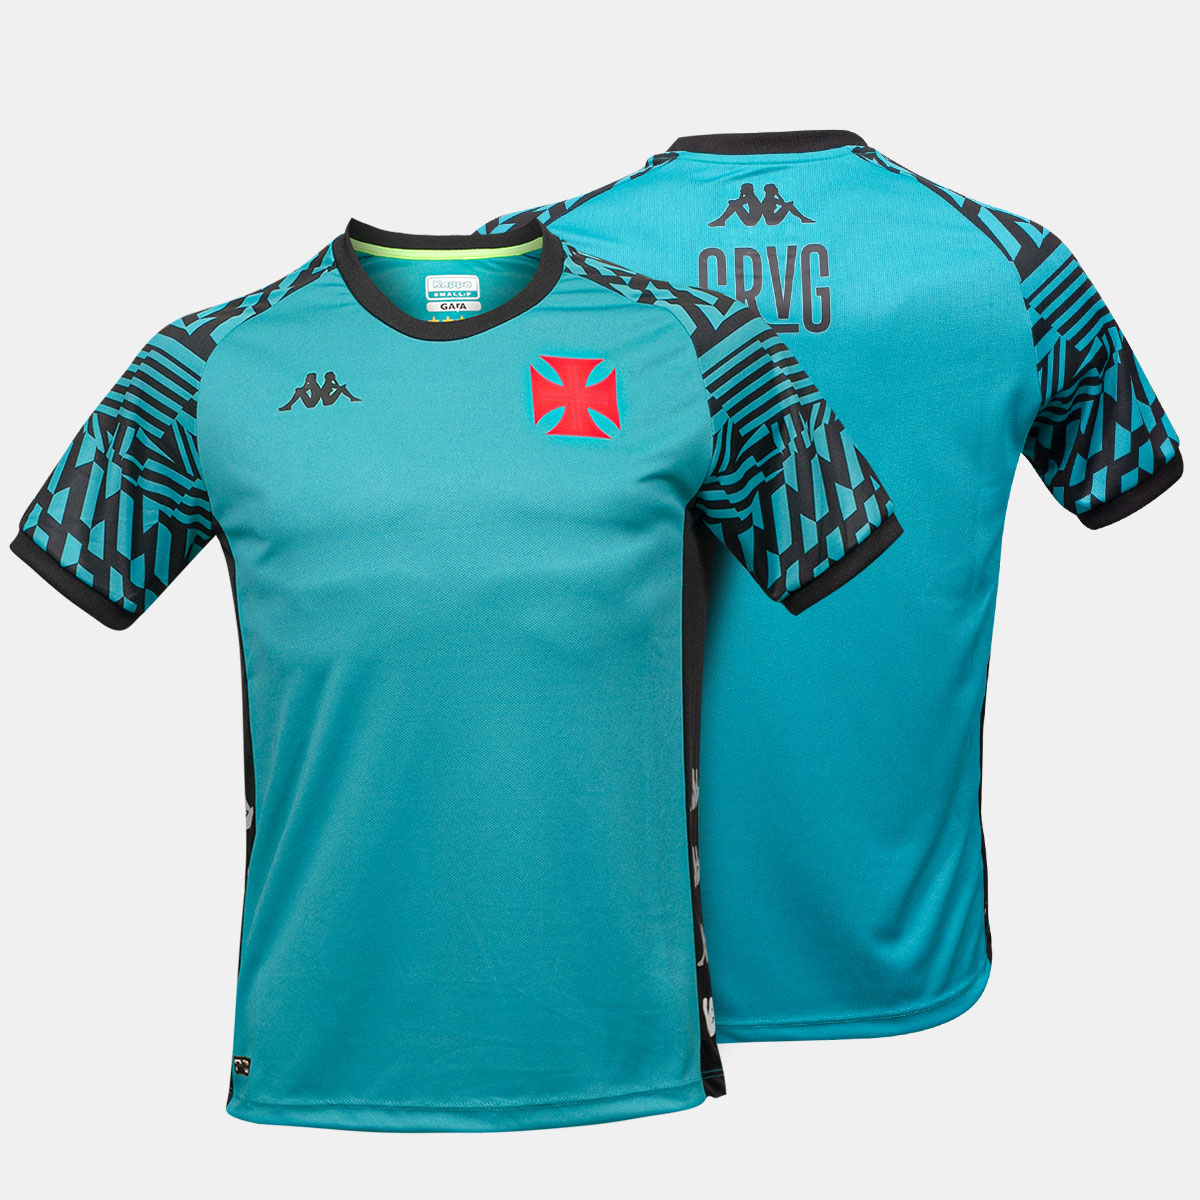 Camisa Vasco Mascuina Treino Atleta Tamanho Especial Kappa 2021